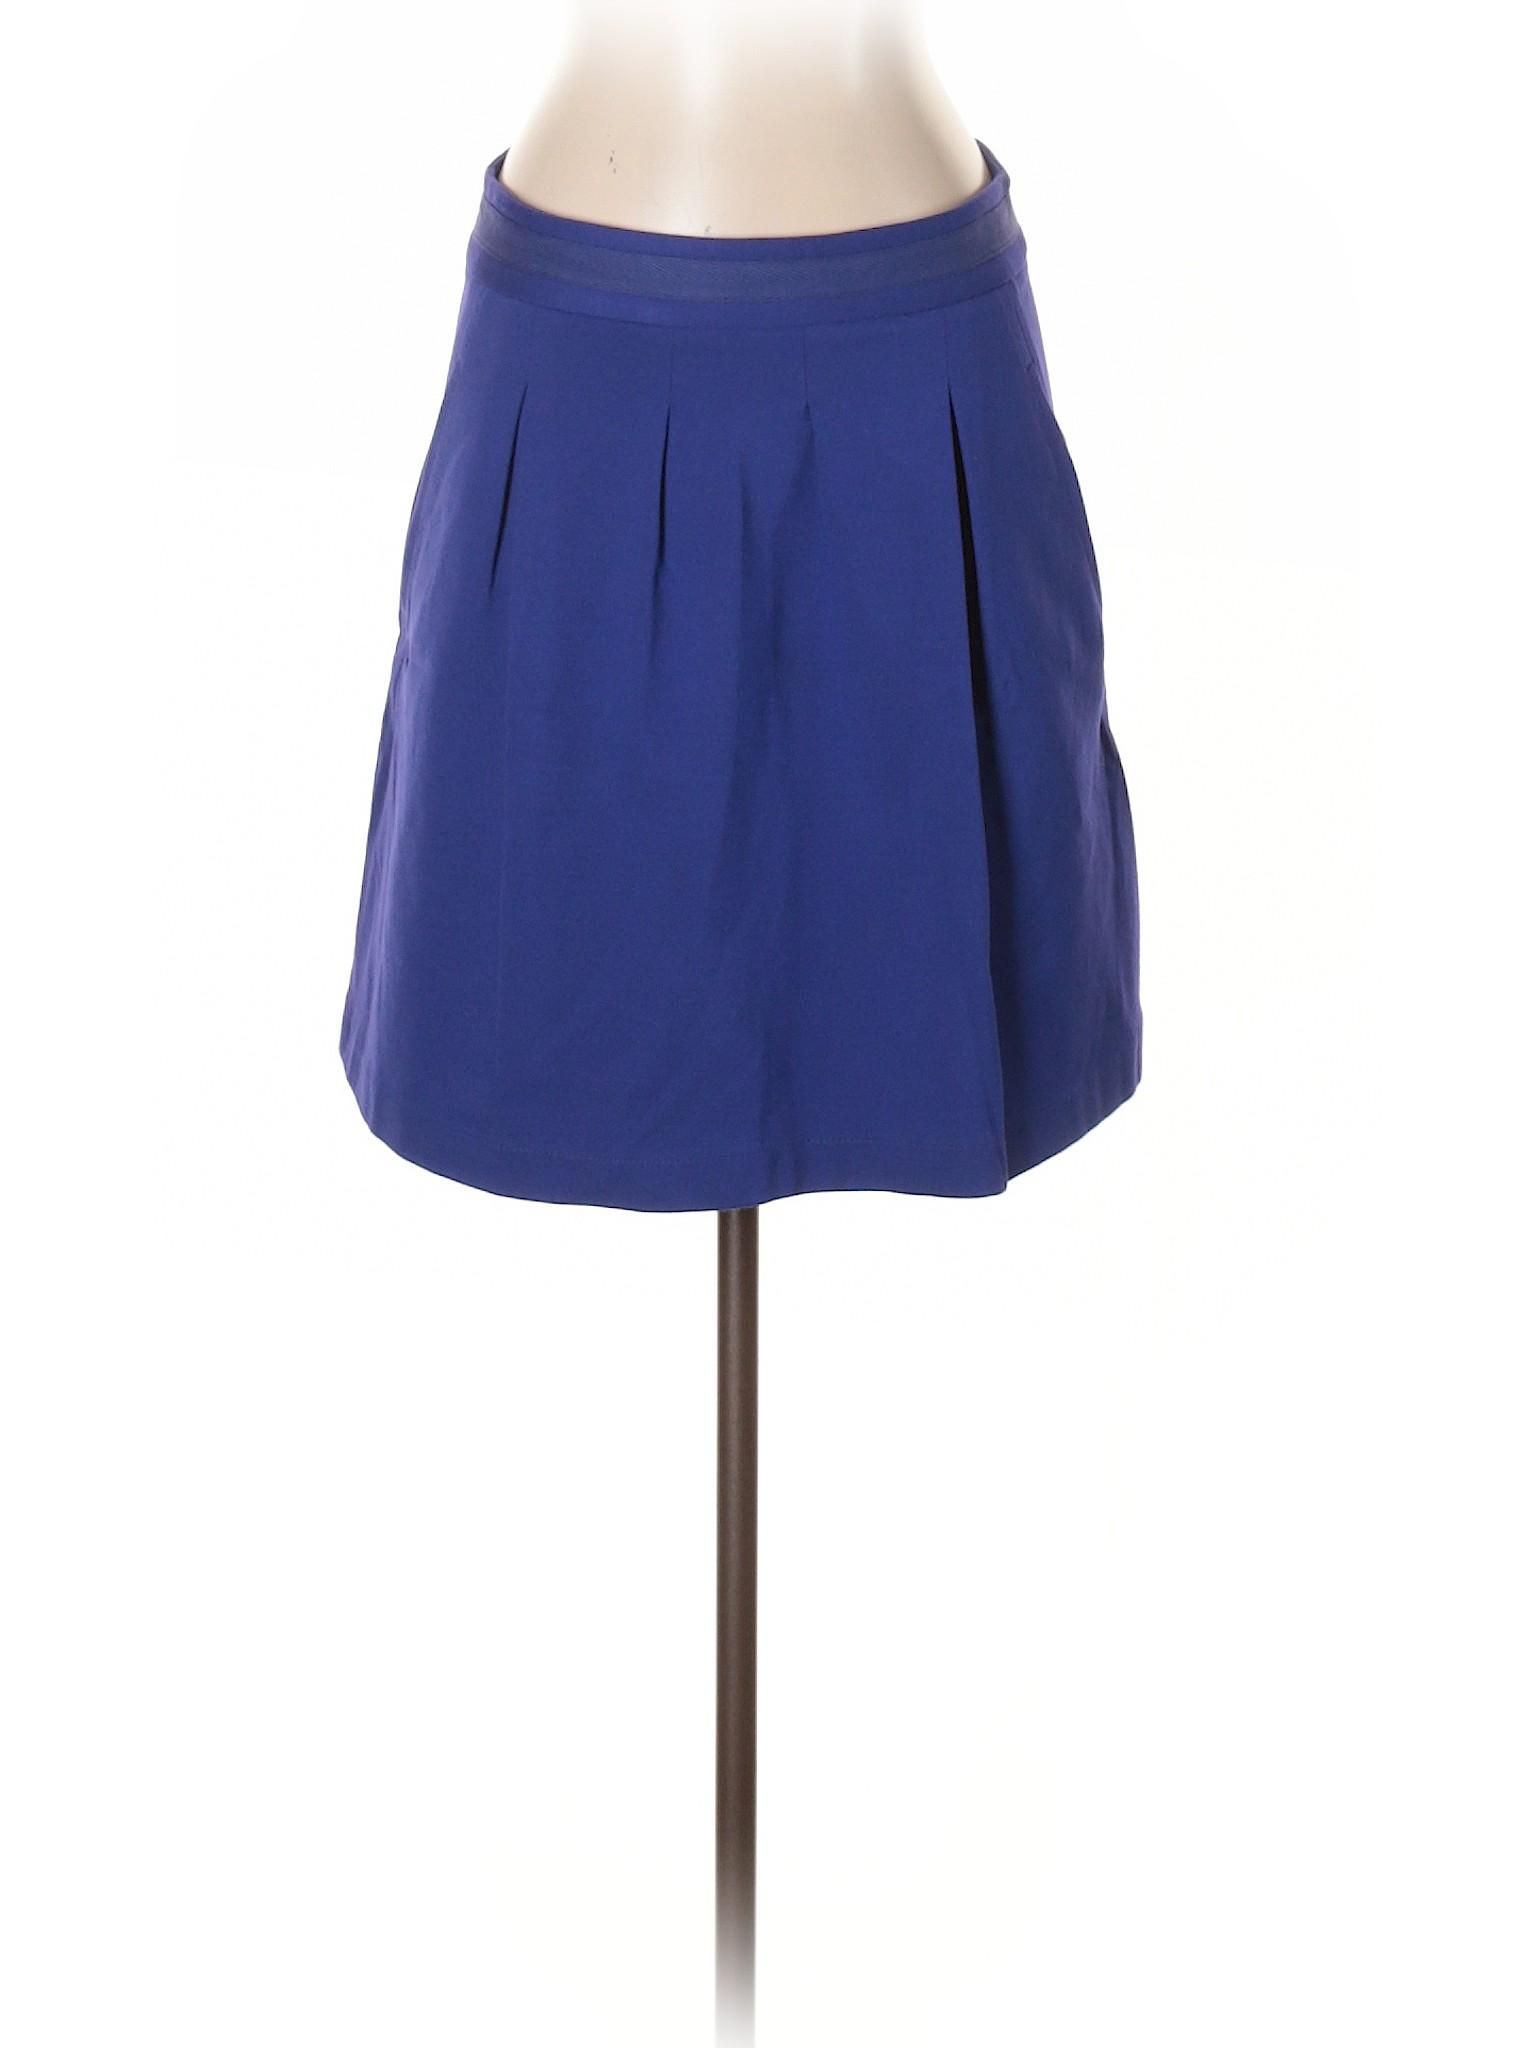 Skirt Boutique Casual Casual Casual Boutique Skirt Skirt Boutique Casual Skirt Boutique 8qapwSt